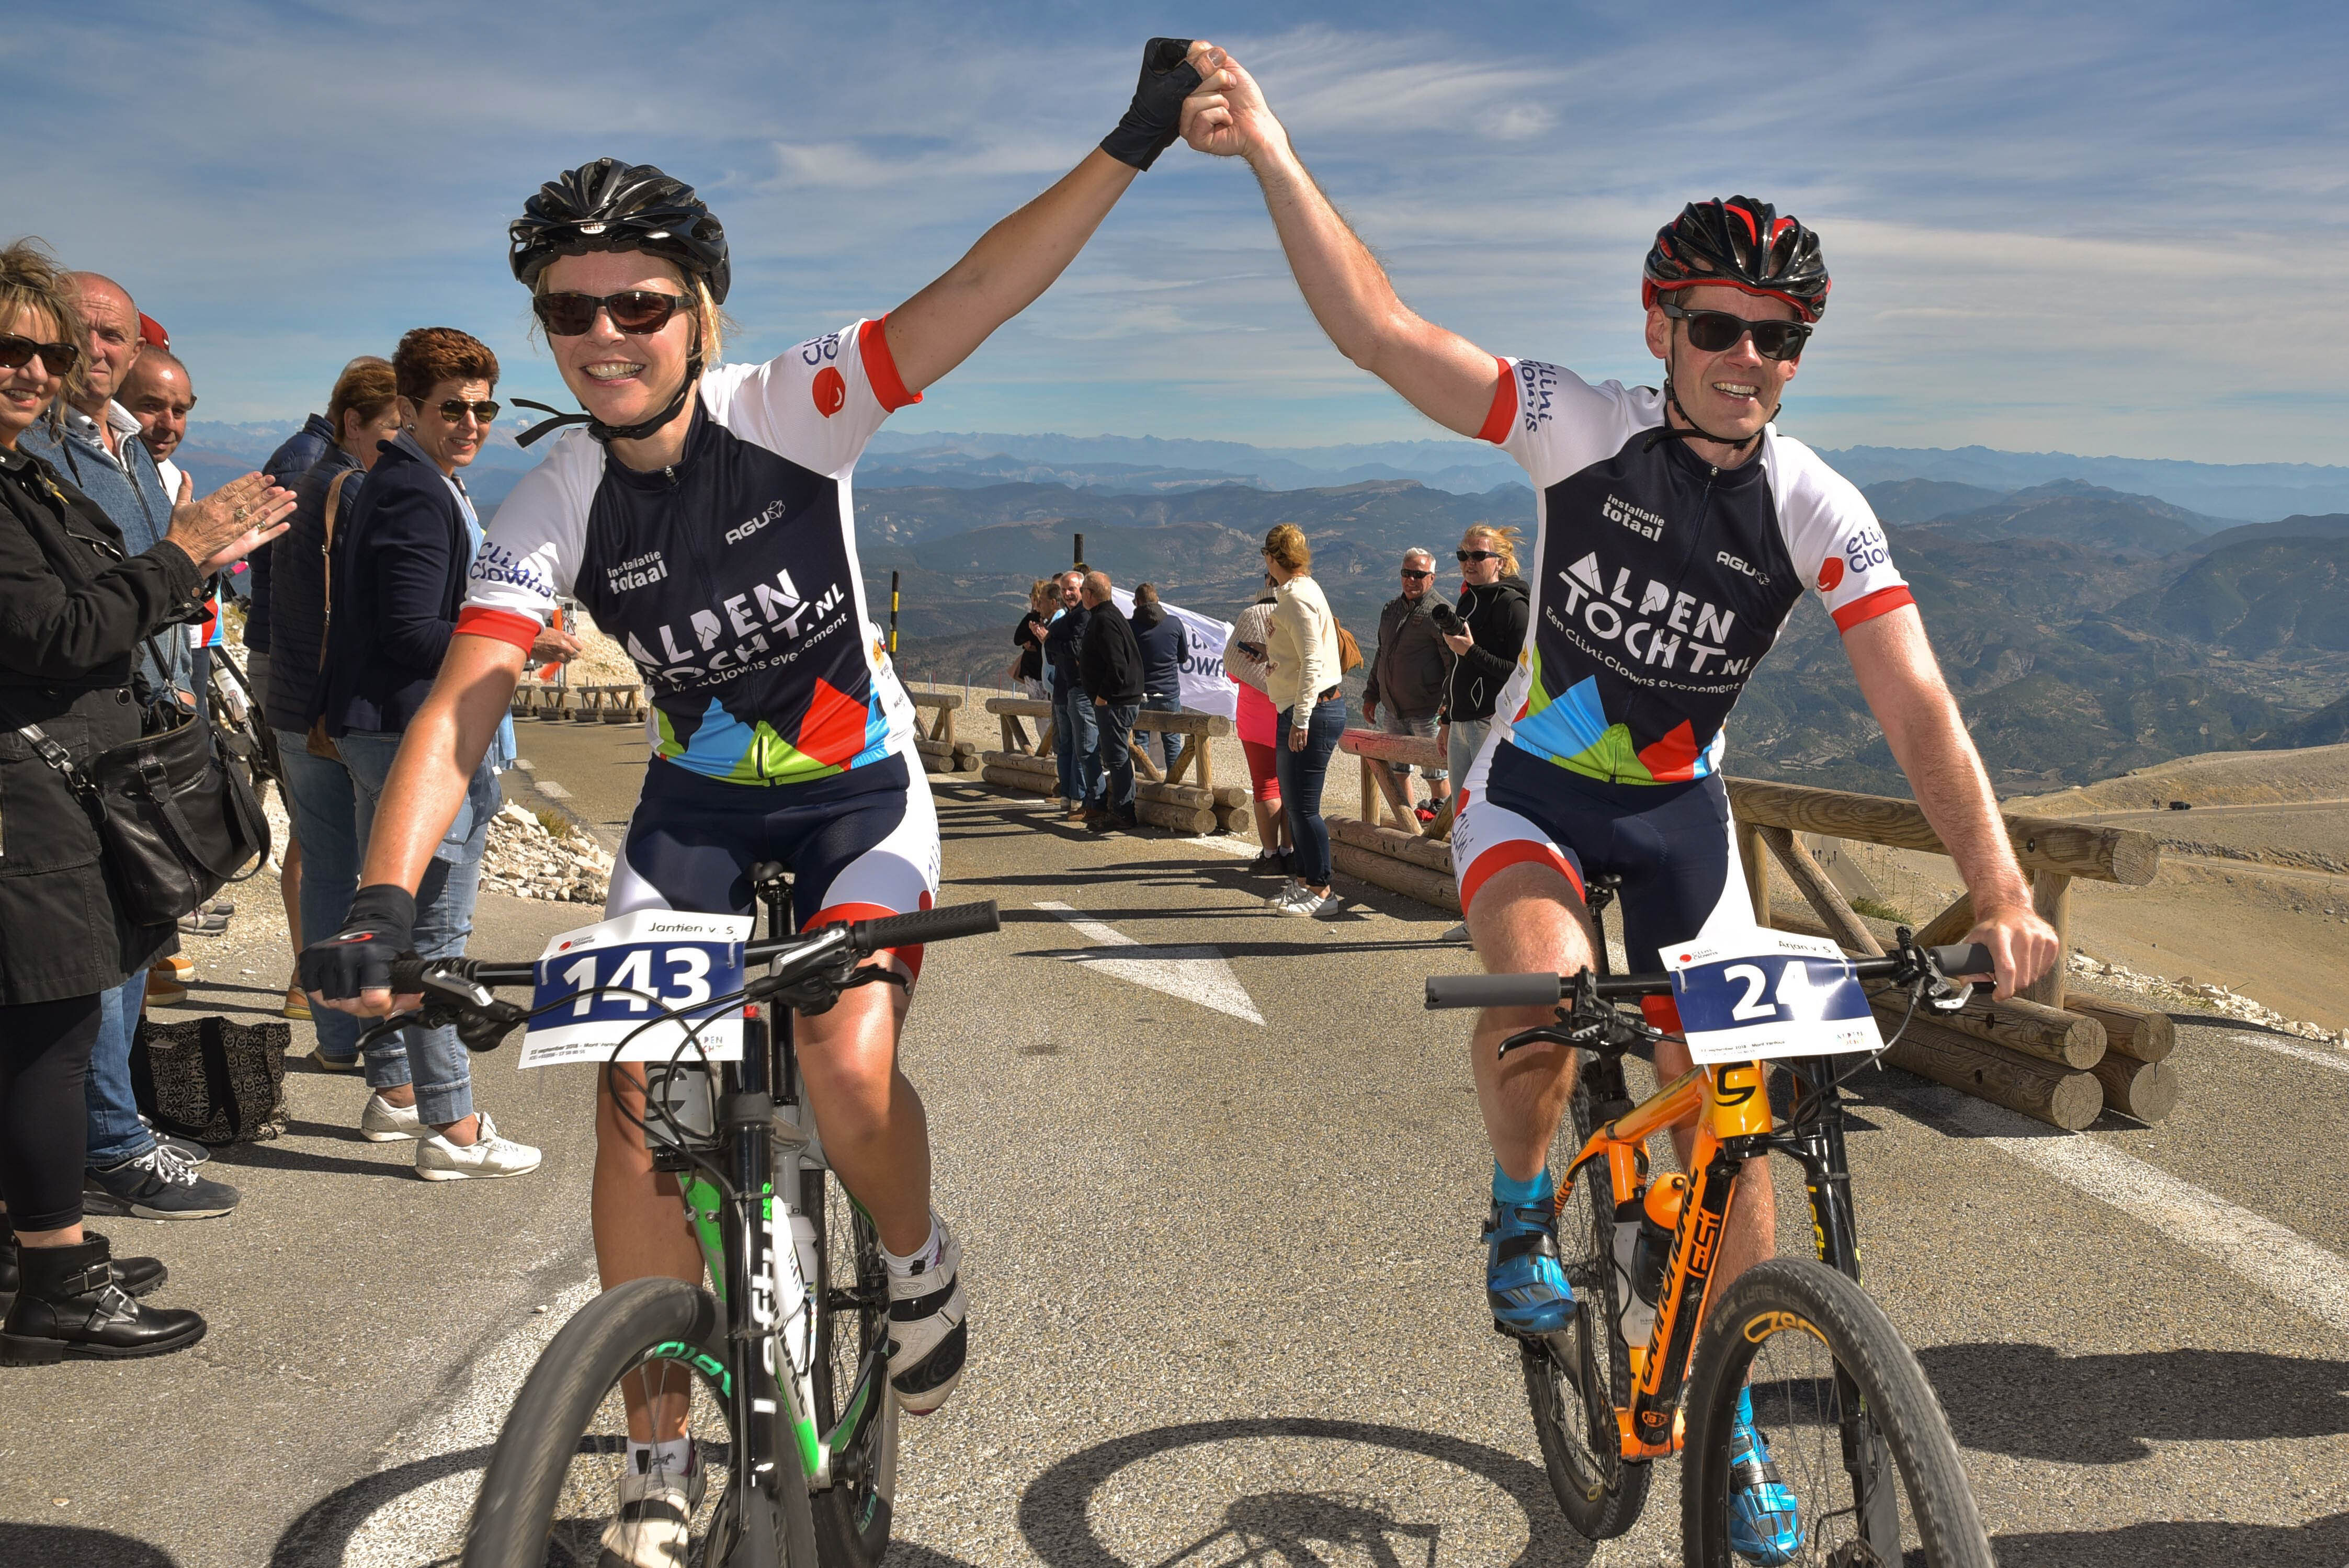 Arjan en Jantien op de Mont Ventoux